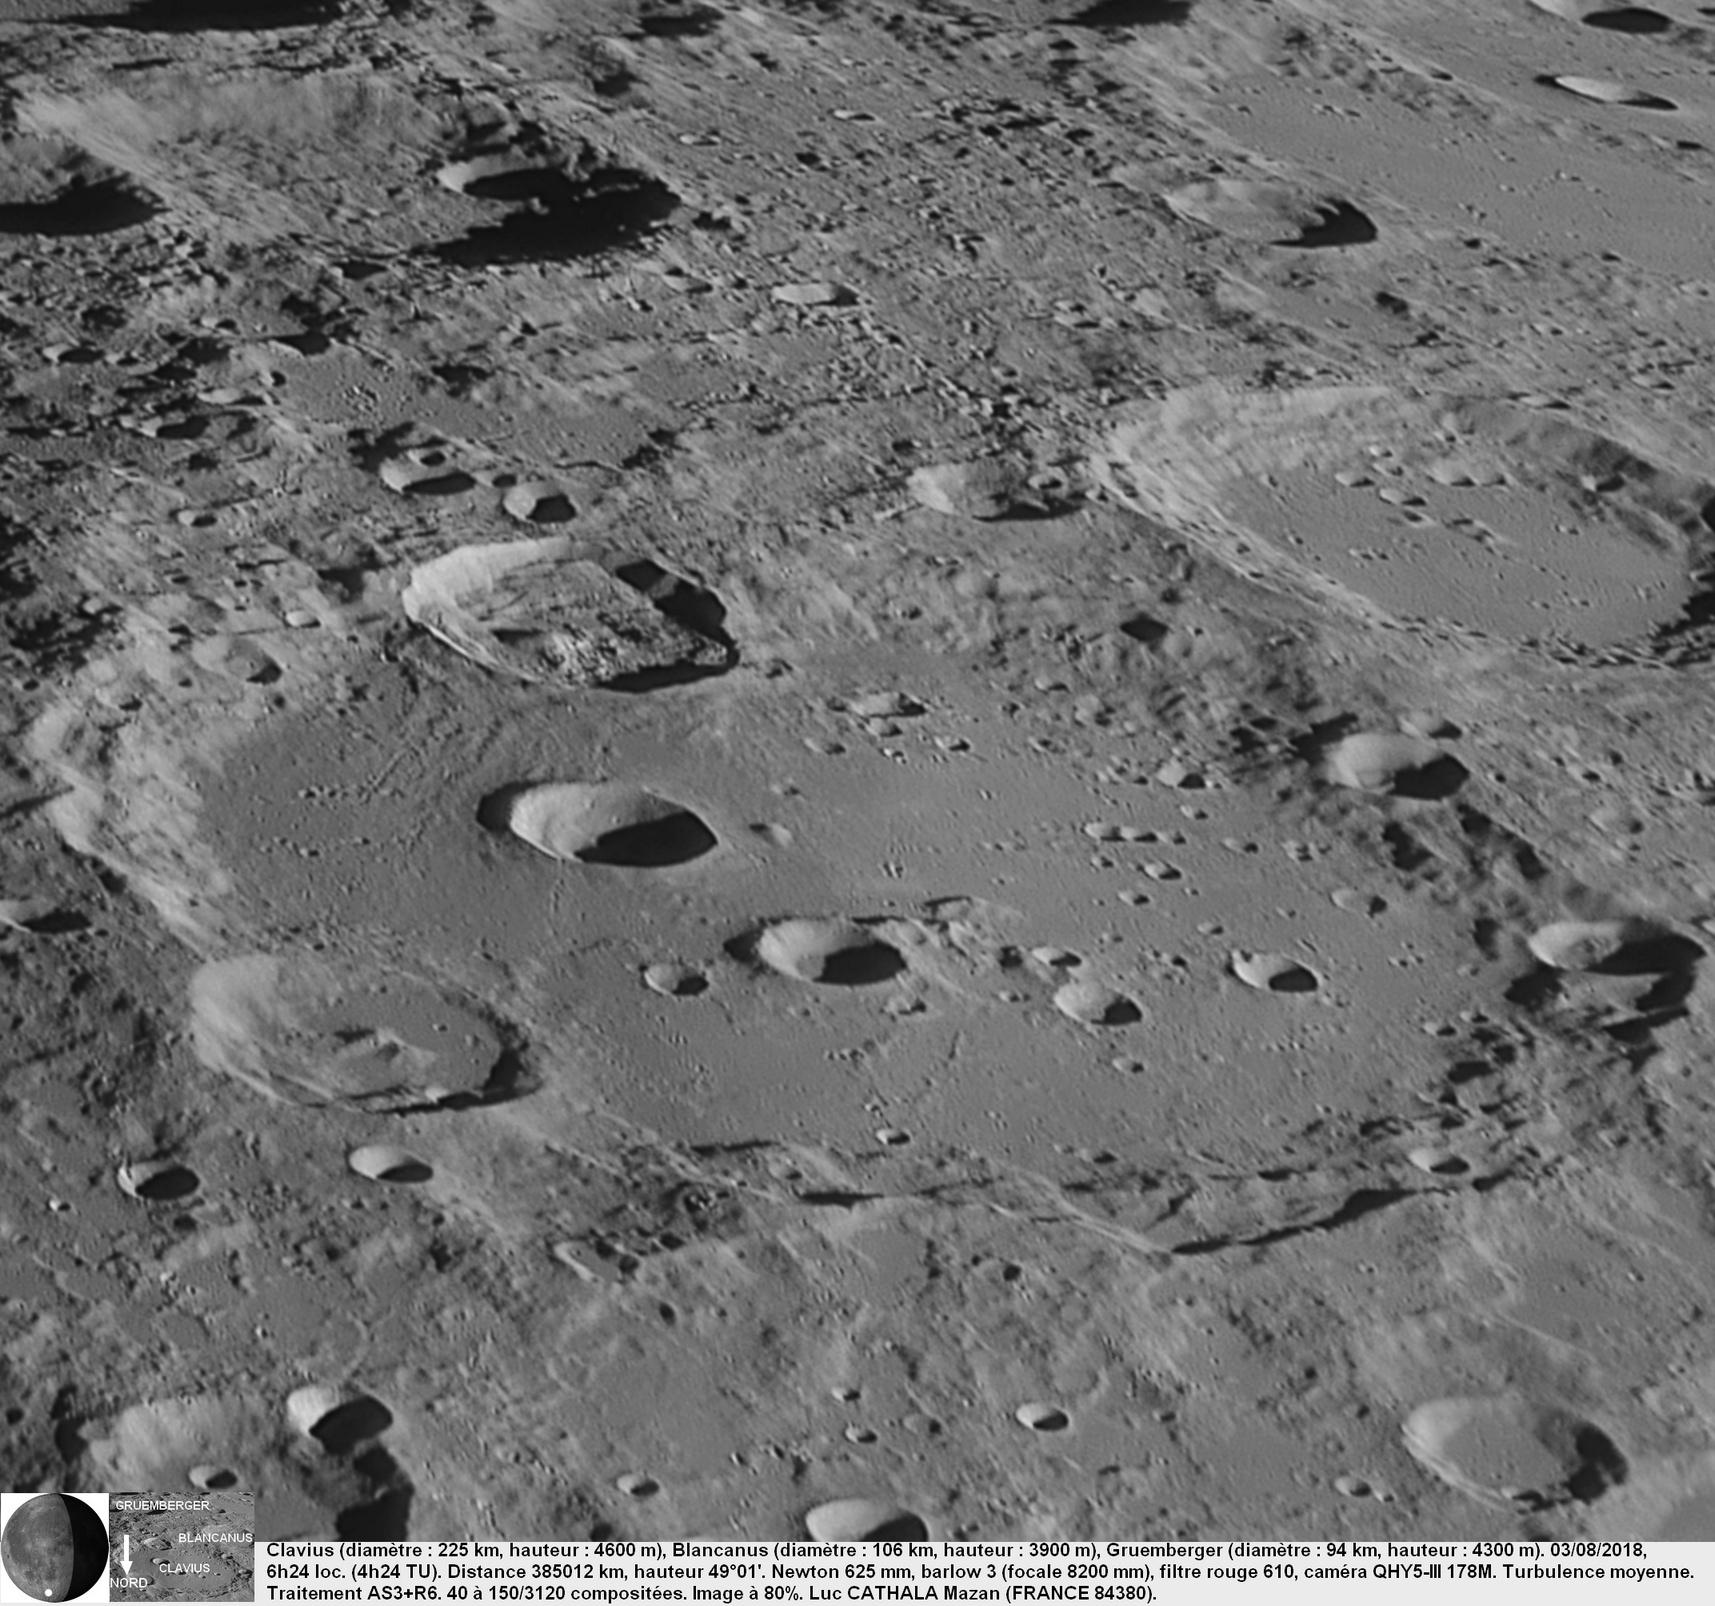 CLAVIUS BLANCANUS GRUEMBERGER 03082018 6H24 625mm barlow 3 610 80% Luc CATHALA.jpg